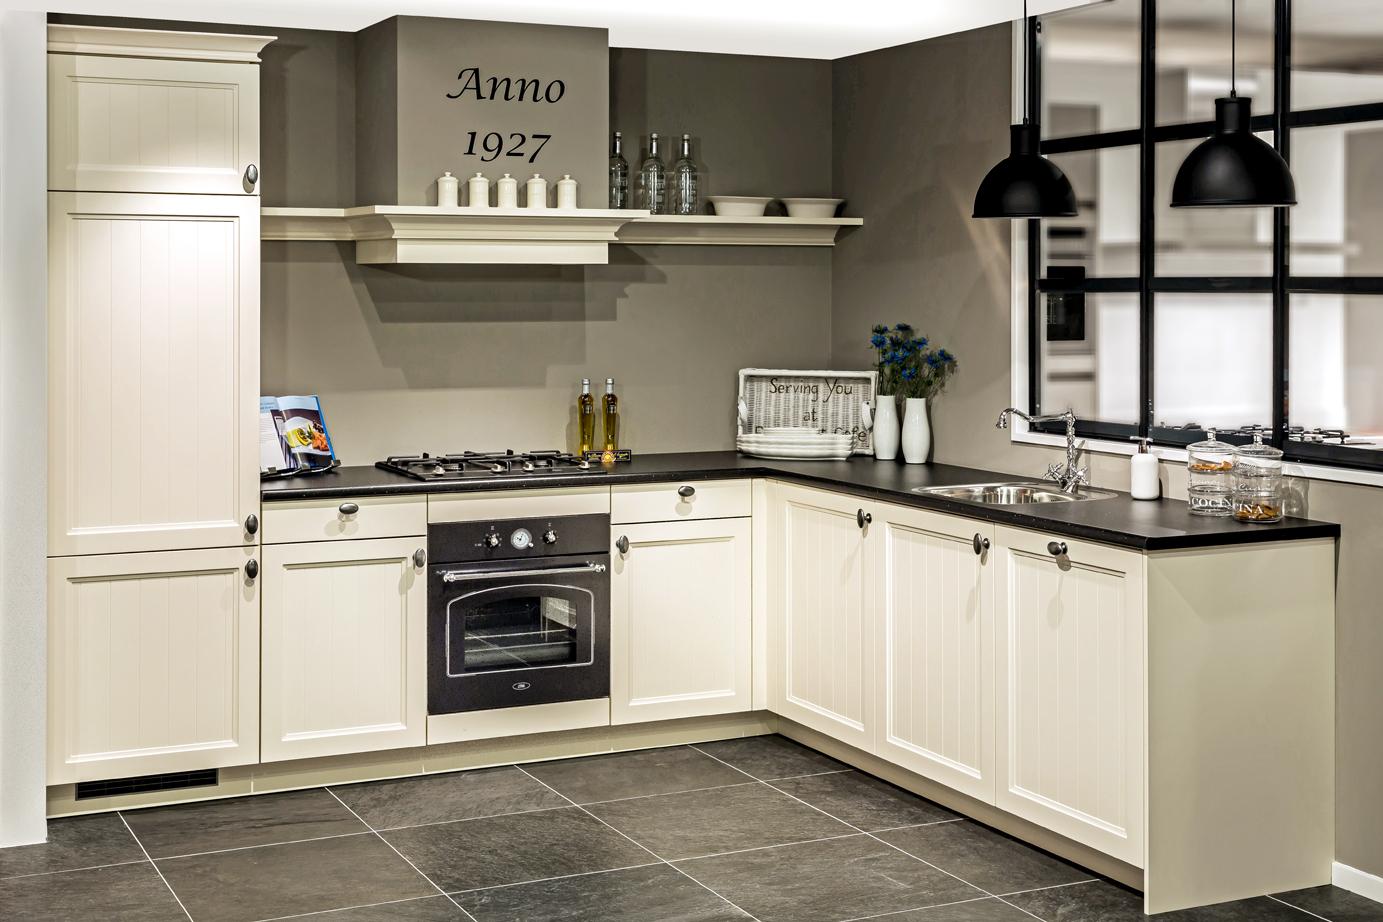 Nieuwe Keuken Kopen Tips : Keukentips